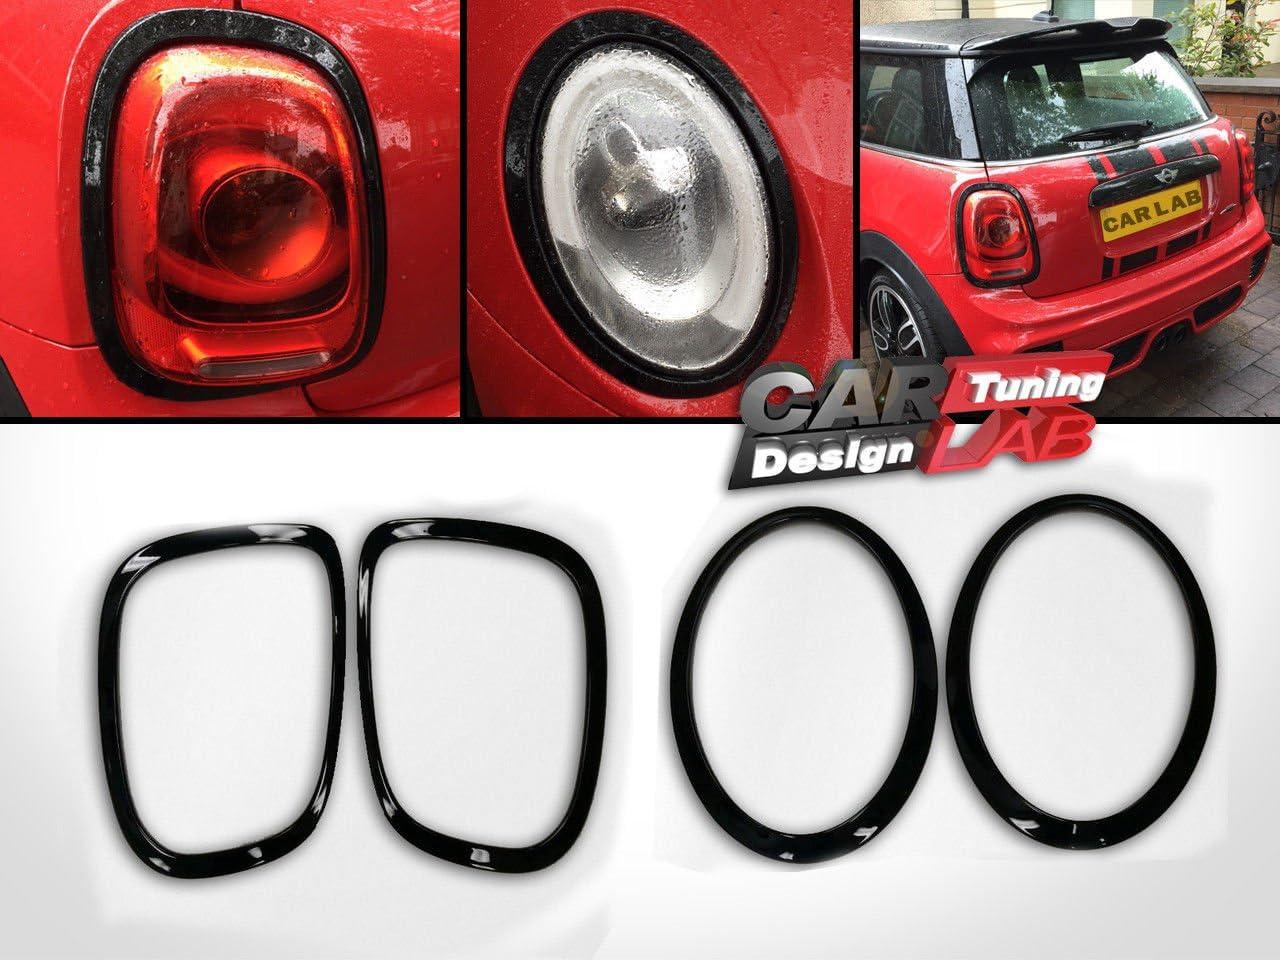 2 Pcs Door Handle Trim for MINI JCW Cooper S F56 F57 Hatchback Car Auto Black